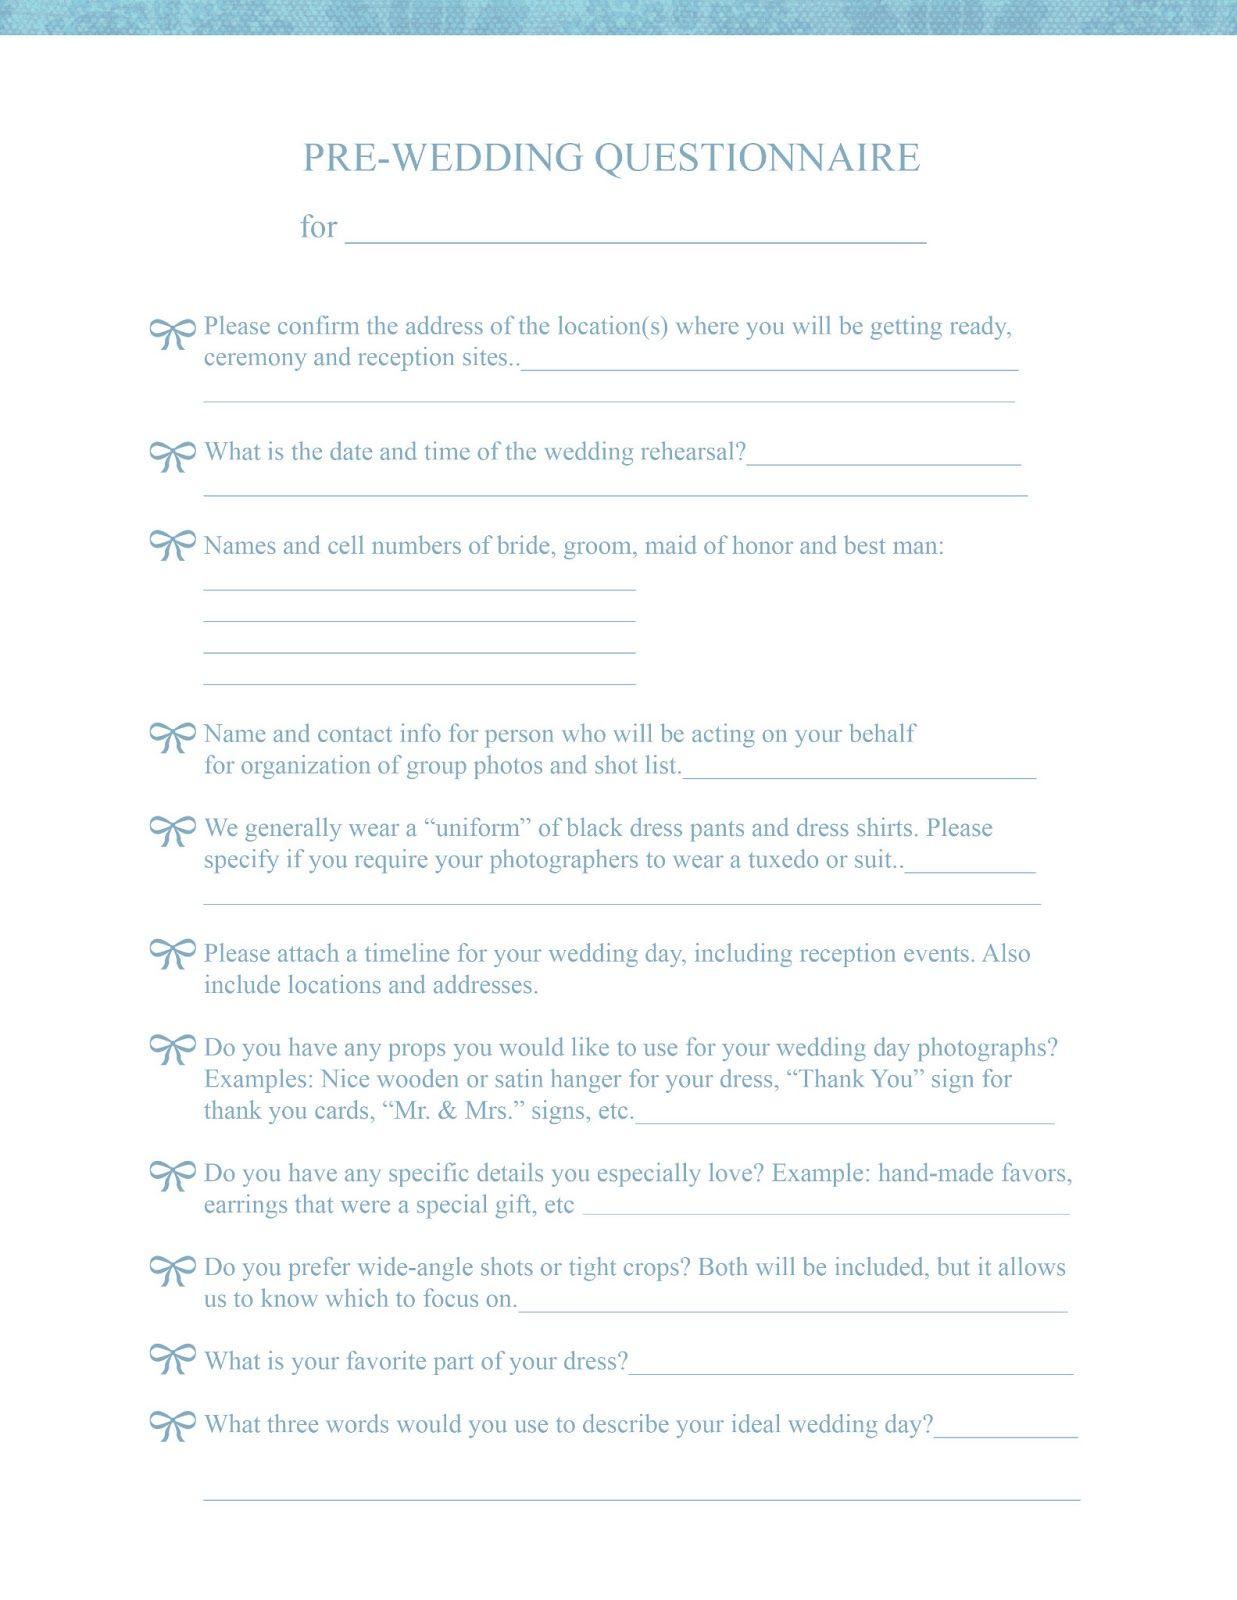 PreWedding Consultation Form  For Photographers  Angelhouse